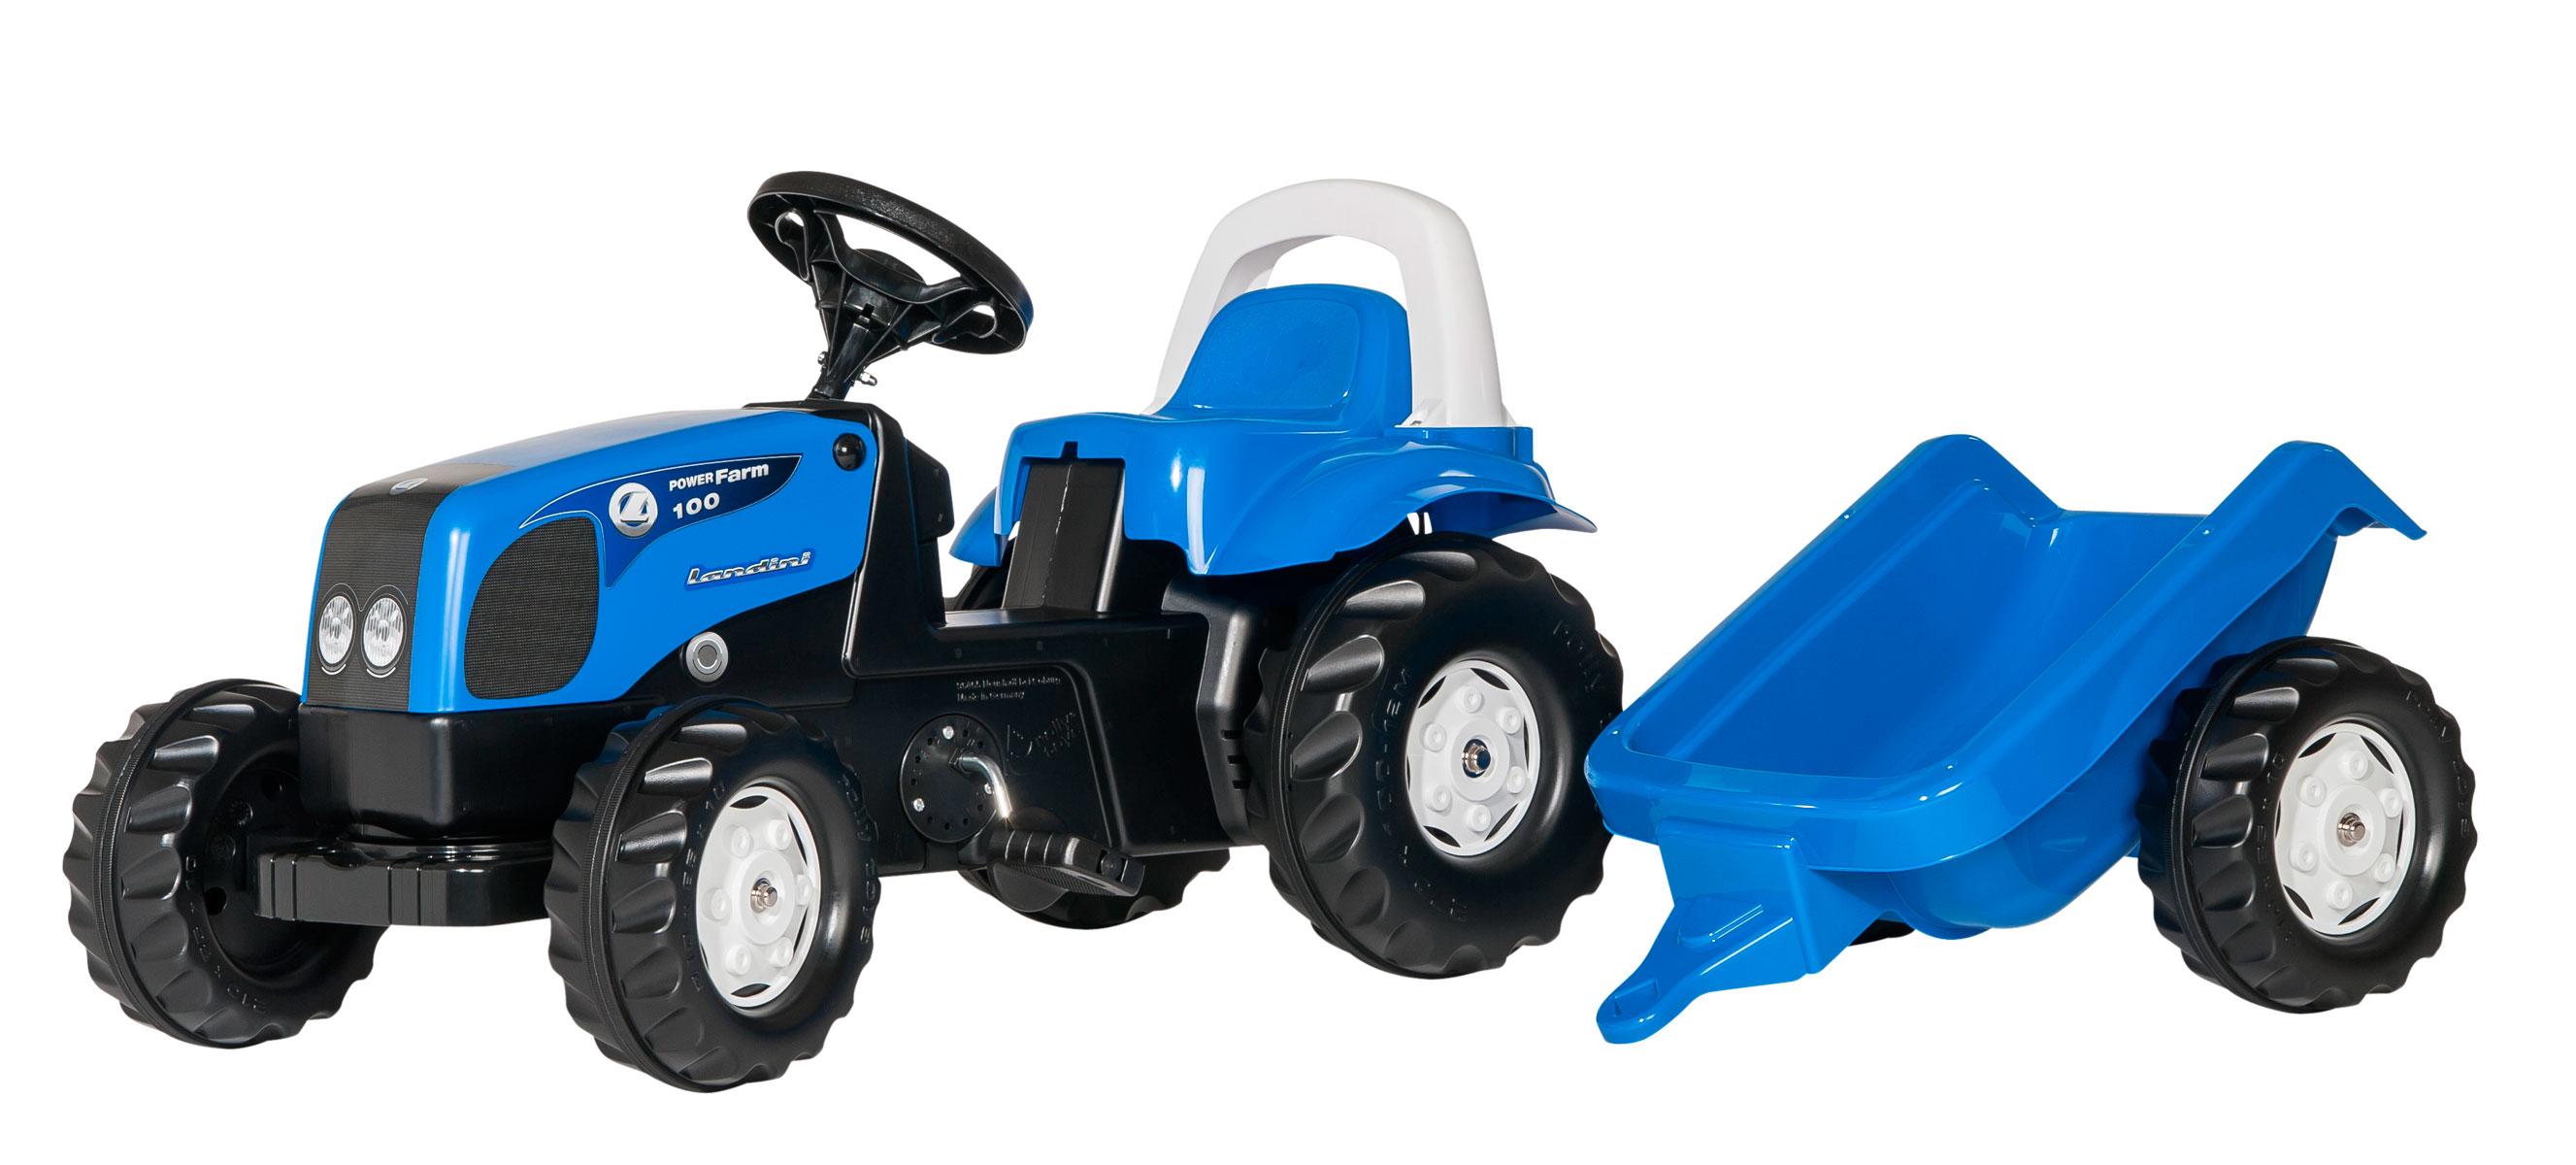 trettraktoren rolly toys traktoren rollykid rolly kid. Black Bedroom Furniture Sets. Home Design Ideas